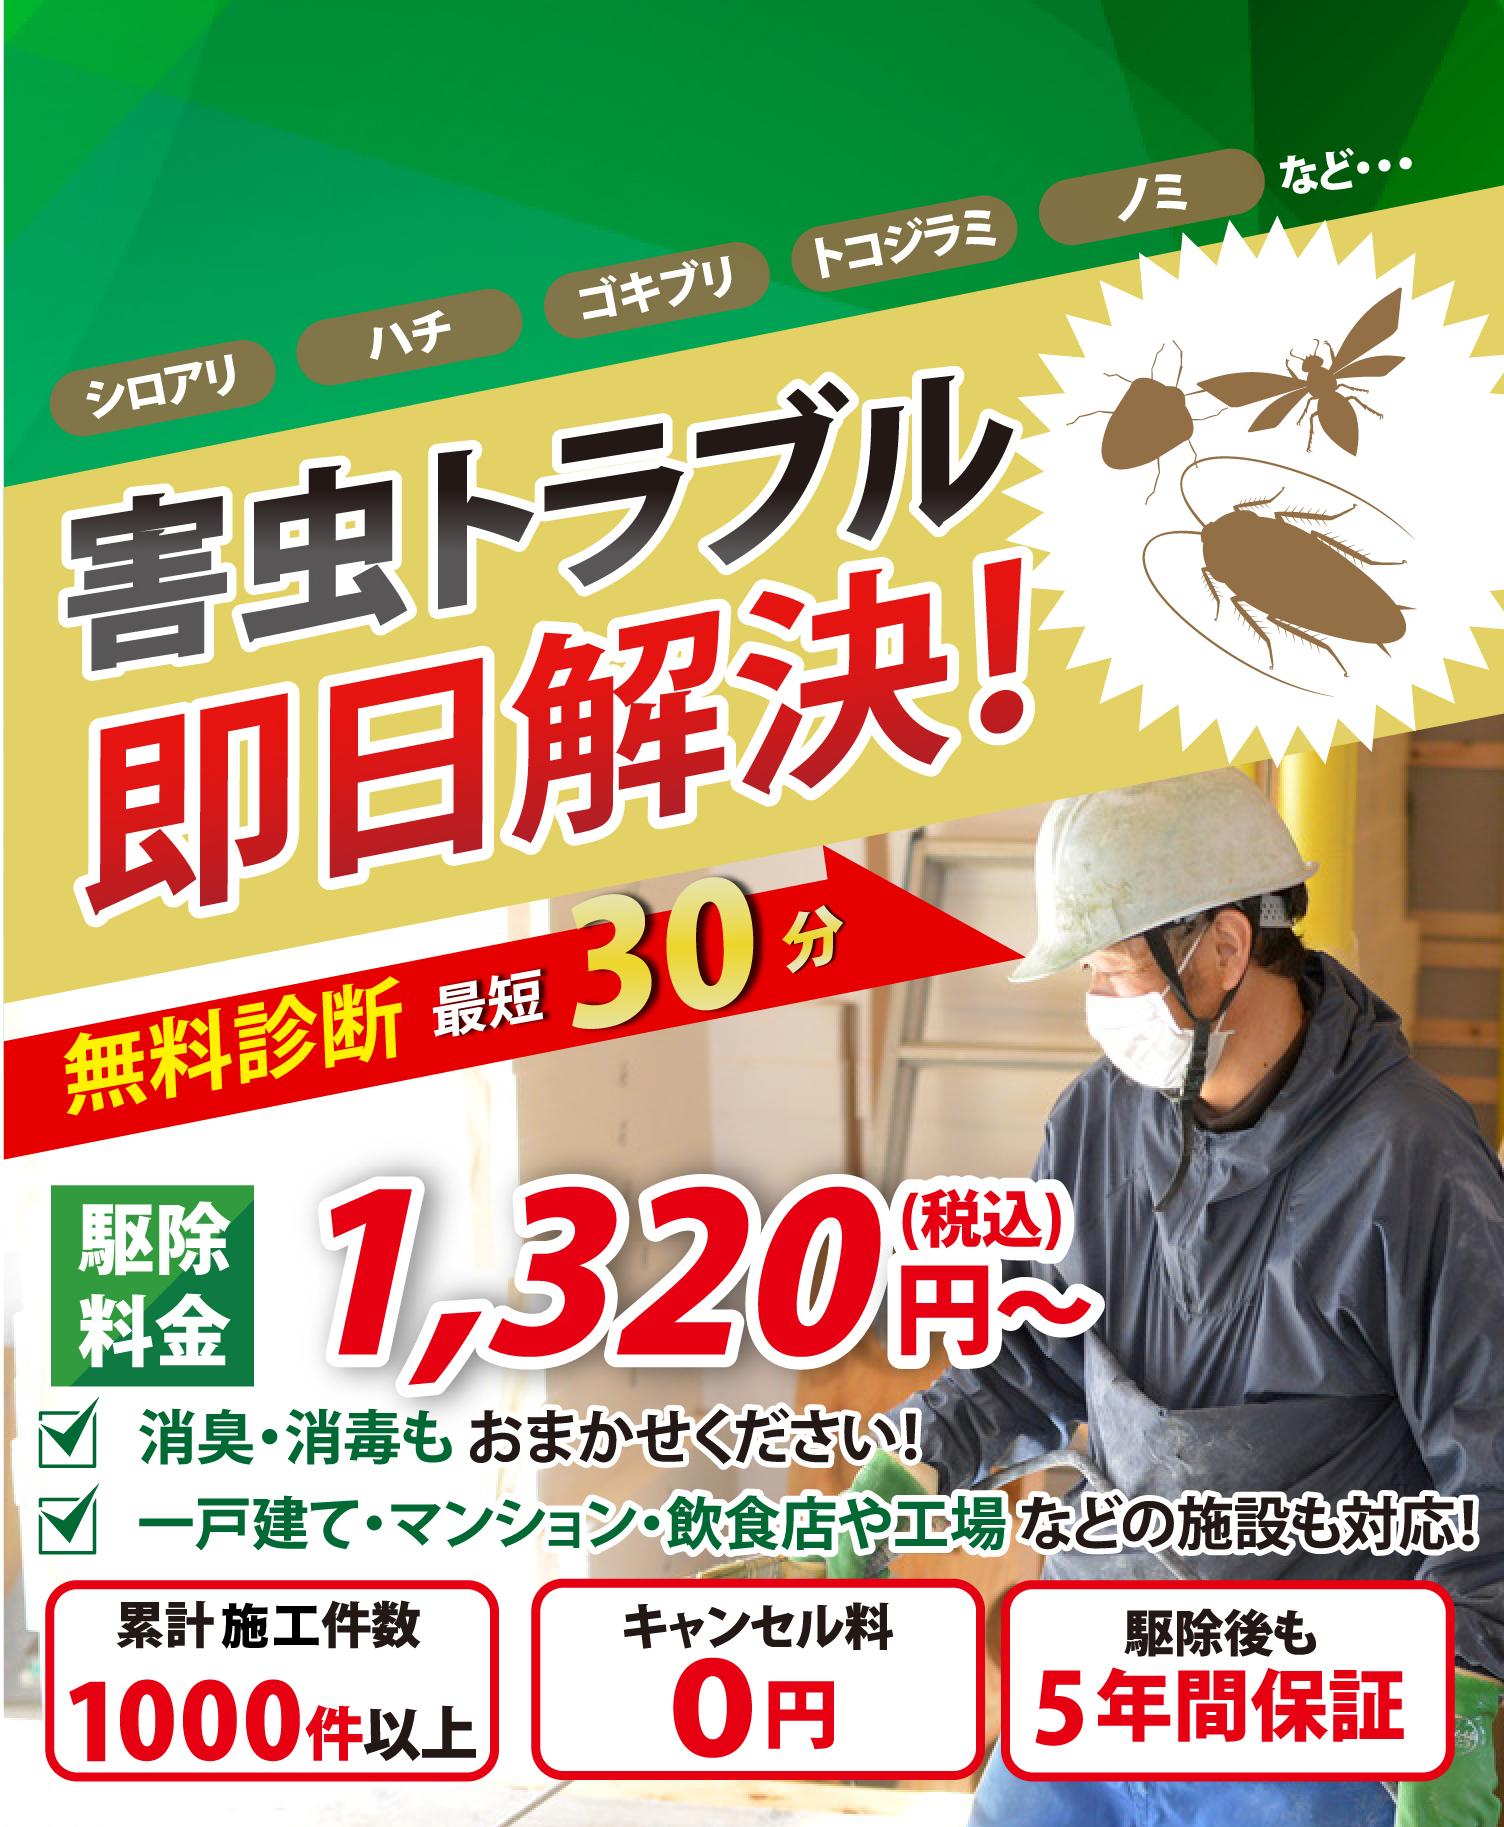 害虫トラブル即日解決! 無料診断最短30分 駆除料金8,000円~